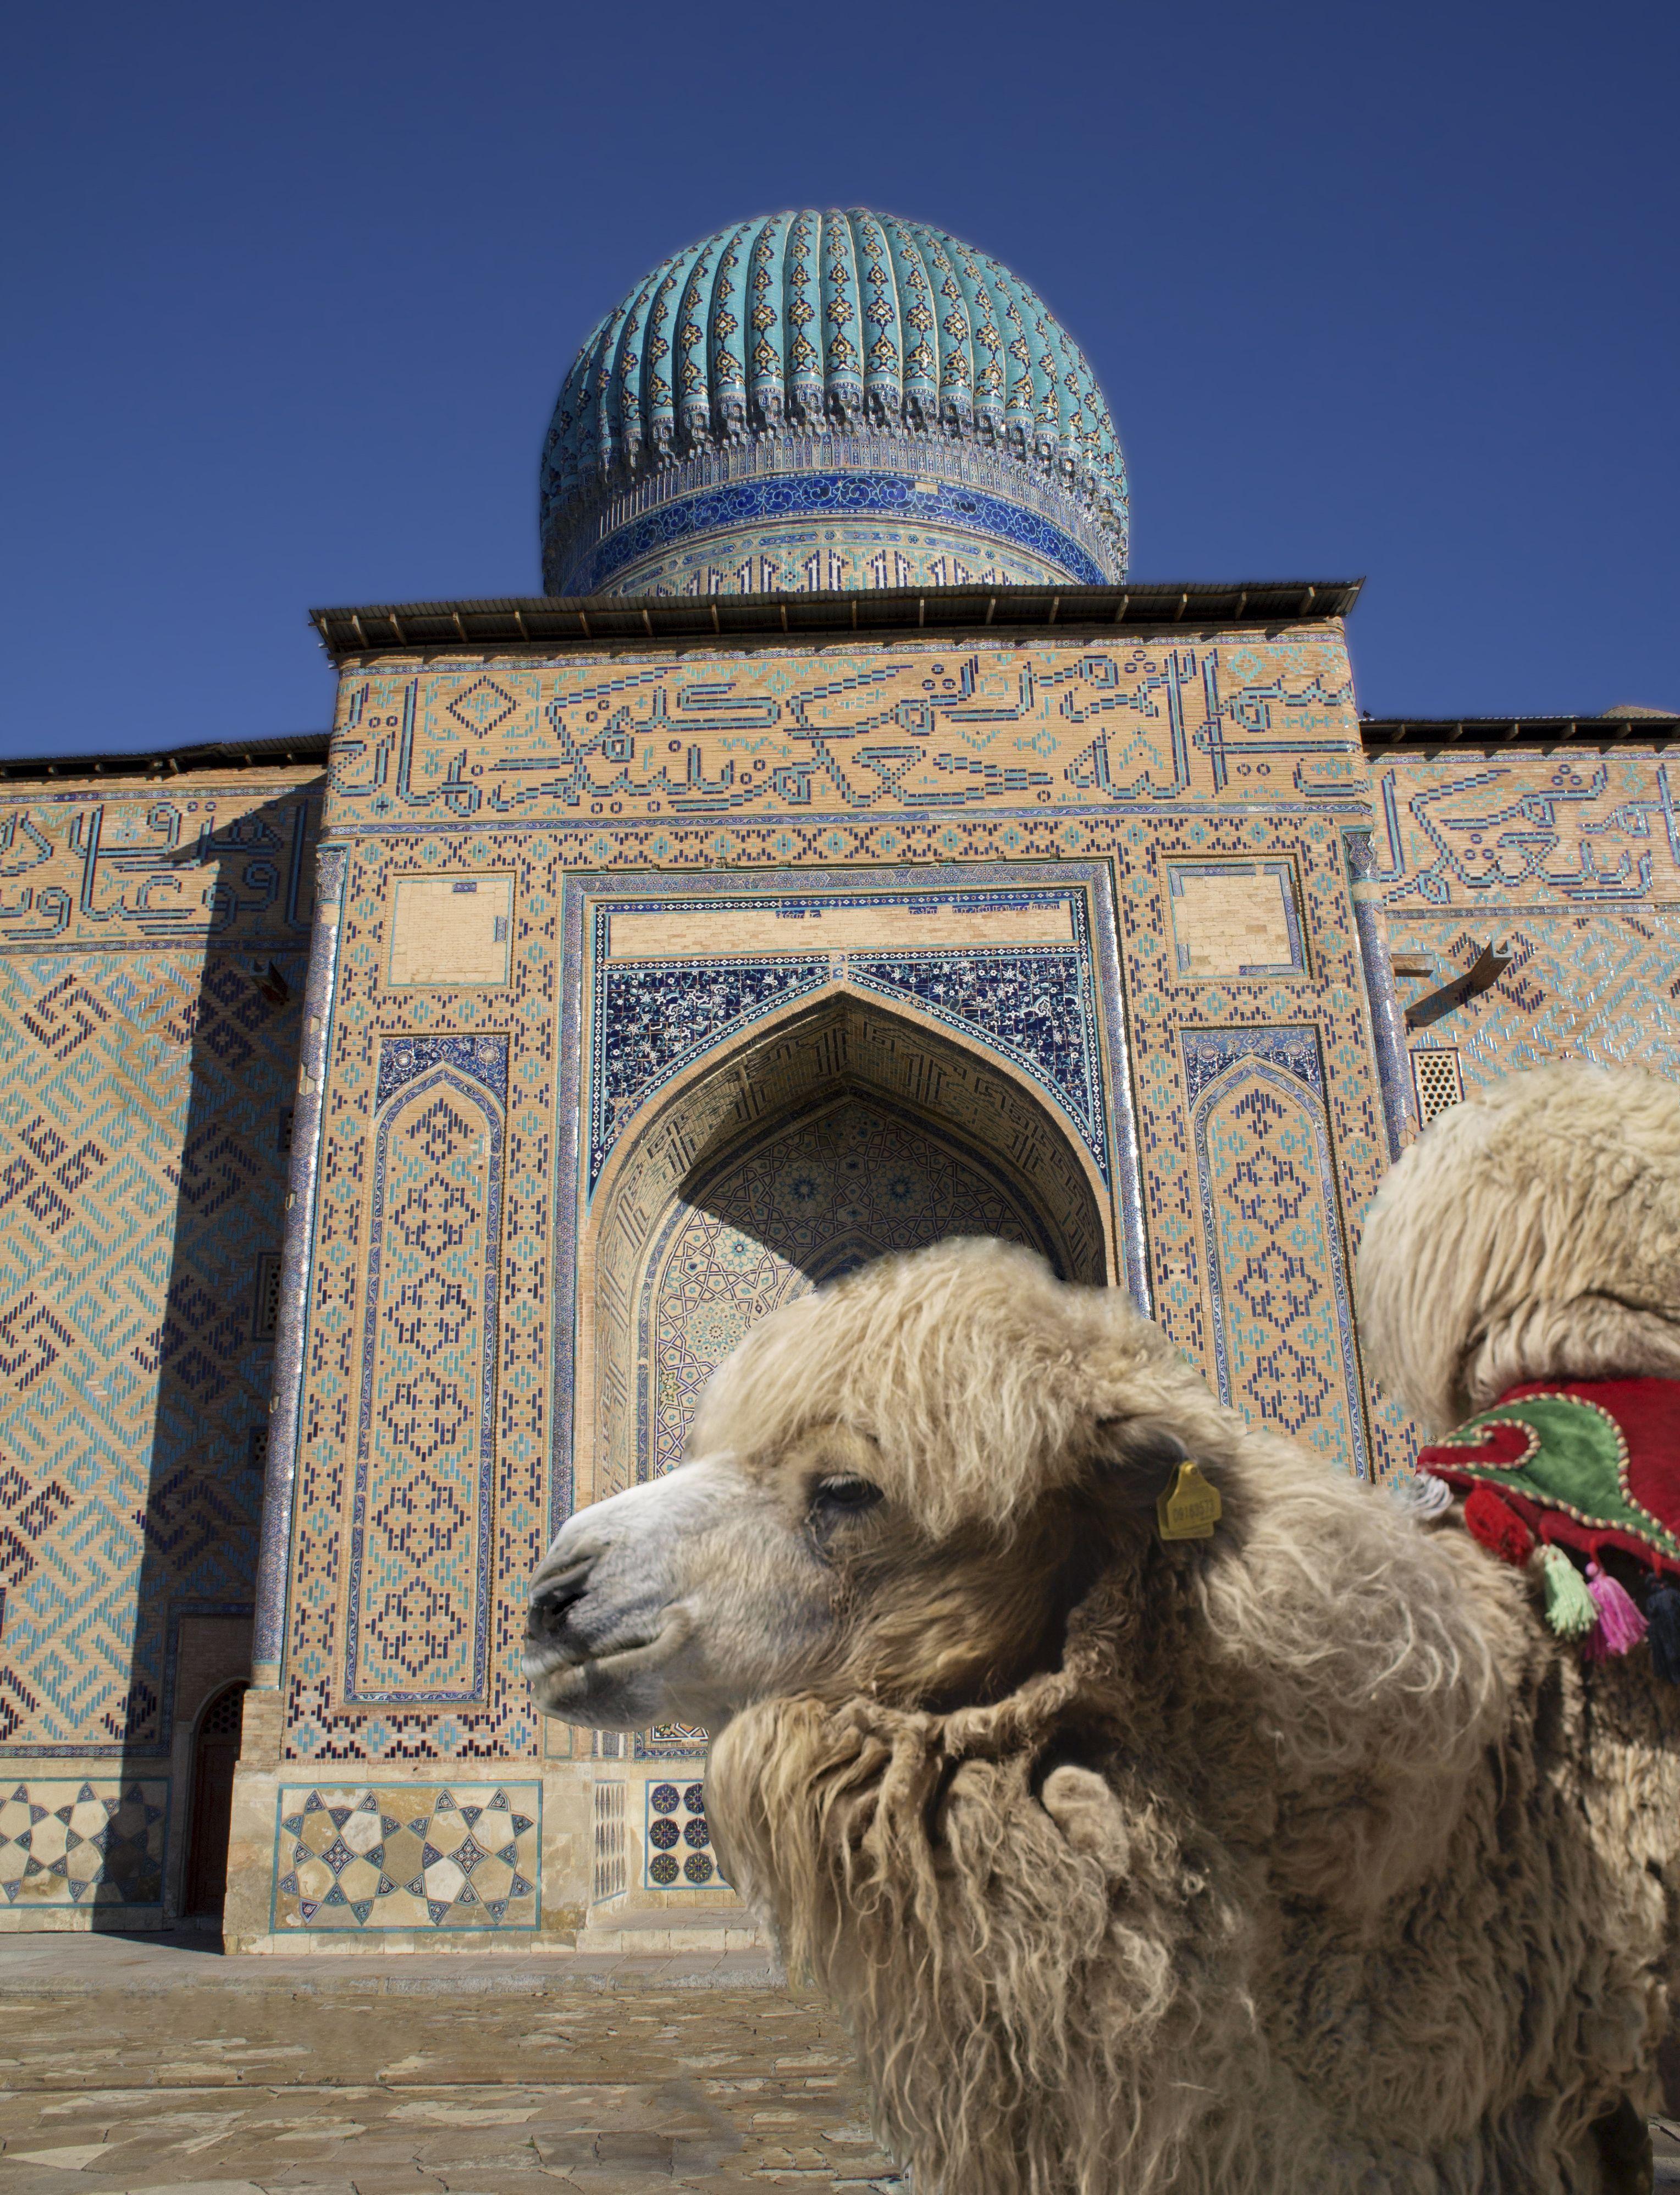 History About Kazakhstan Kazakhstan Means Land Of The Kazakhs History Of Kazakhstan Kazakh Travel Honeymoon Backpack Backpacking Vacation Ural Kasachstan